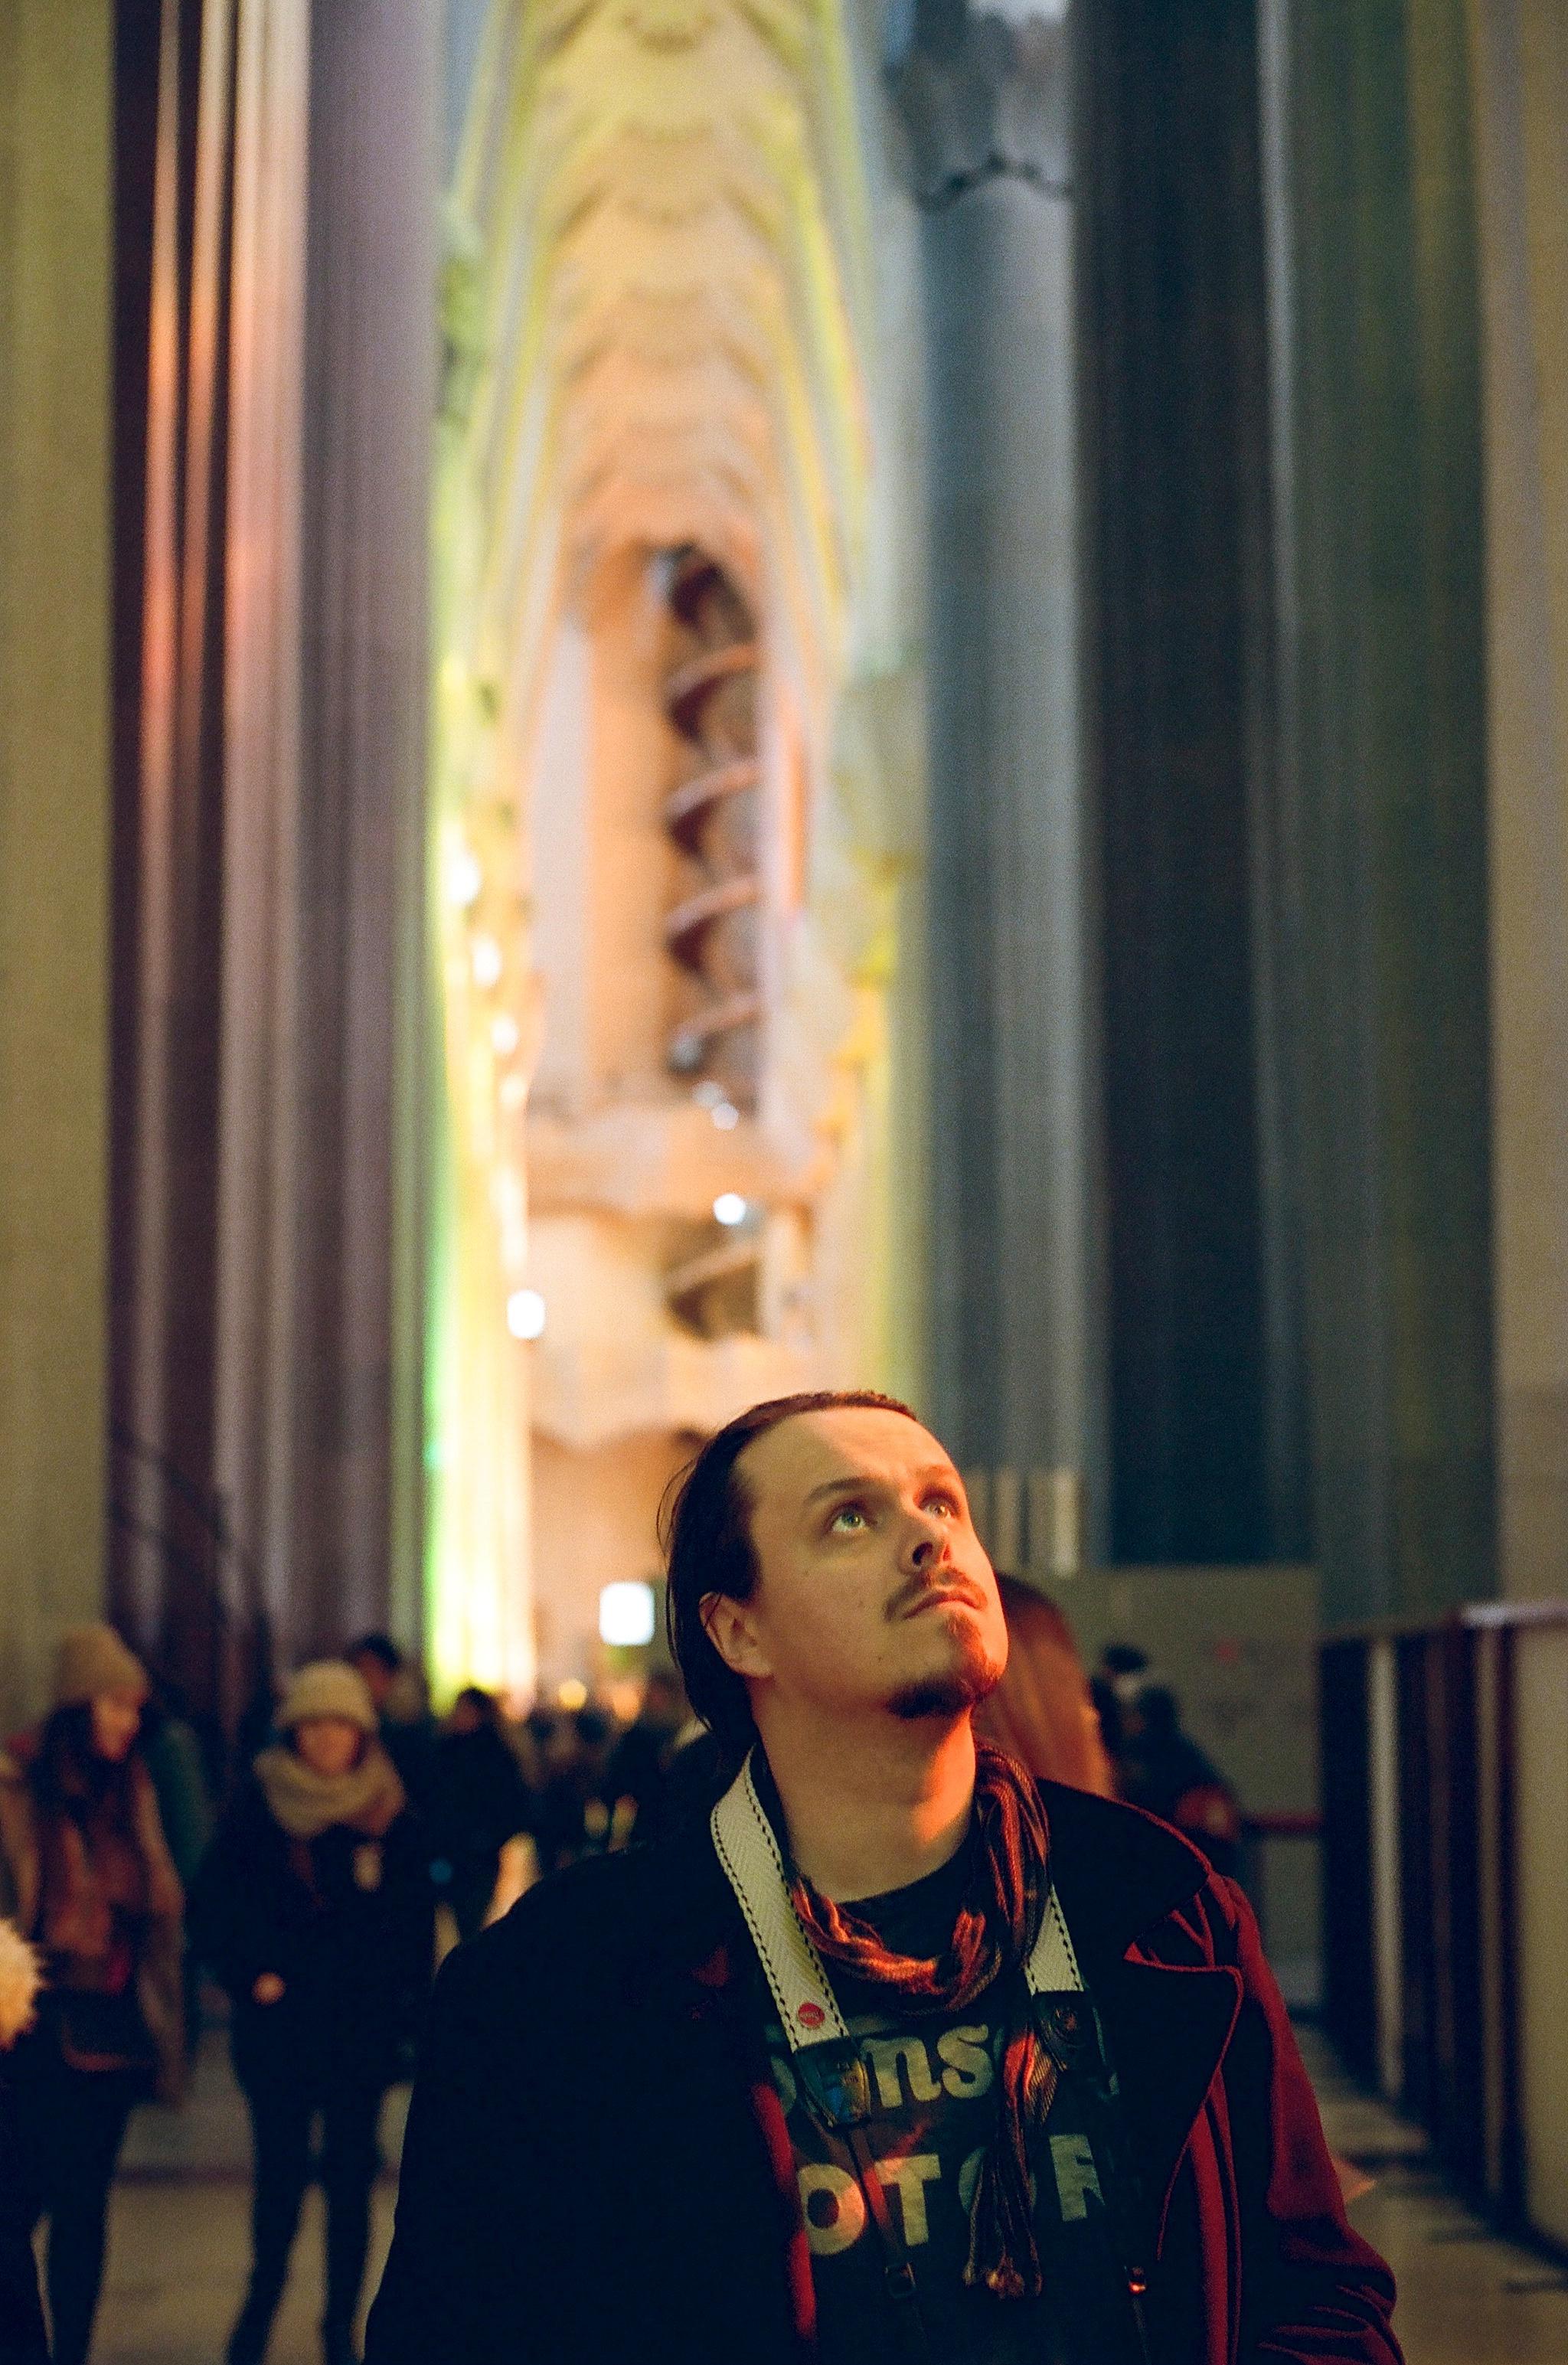 Will - Sagrada Familia, Barcelona